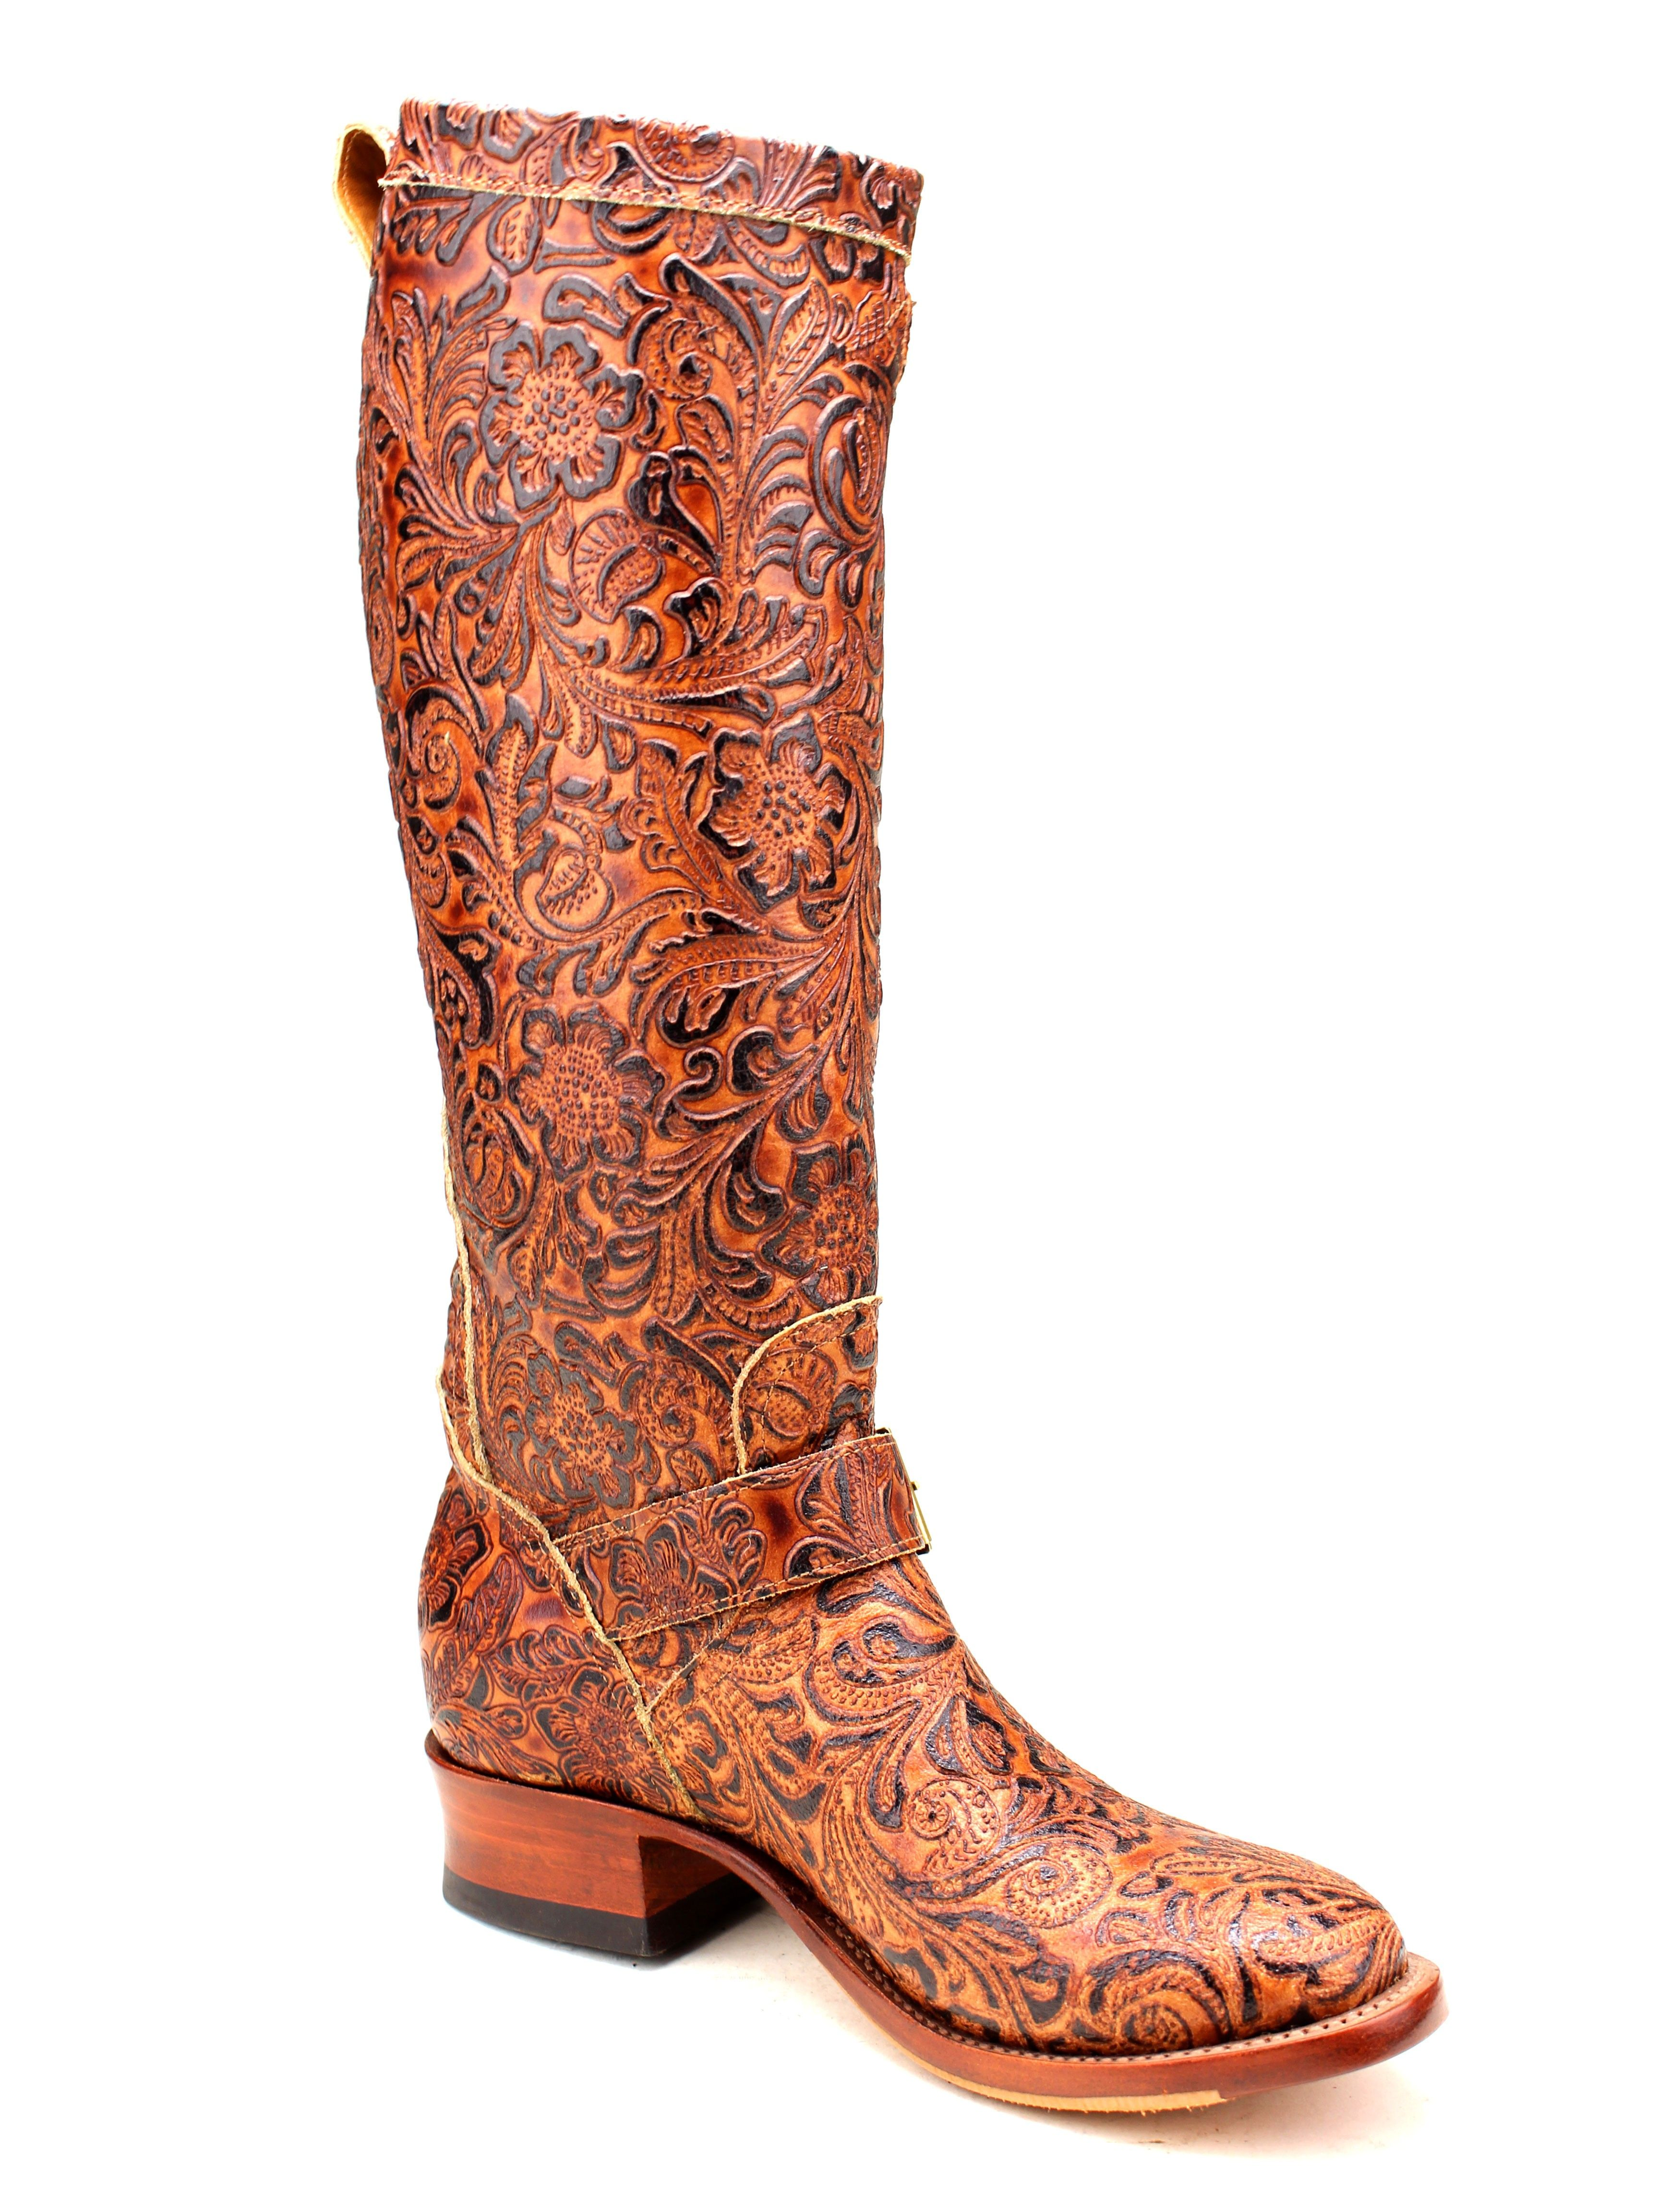 Texas Cowboy Boots | Shop Texas Boot Company | perfect tool